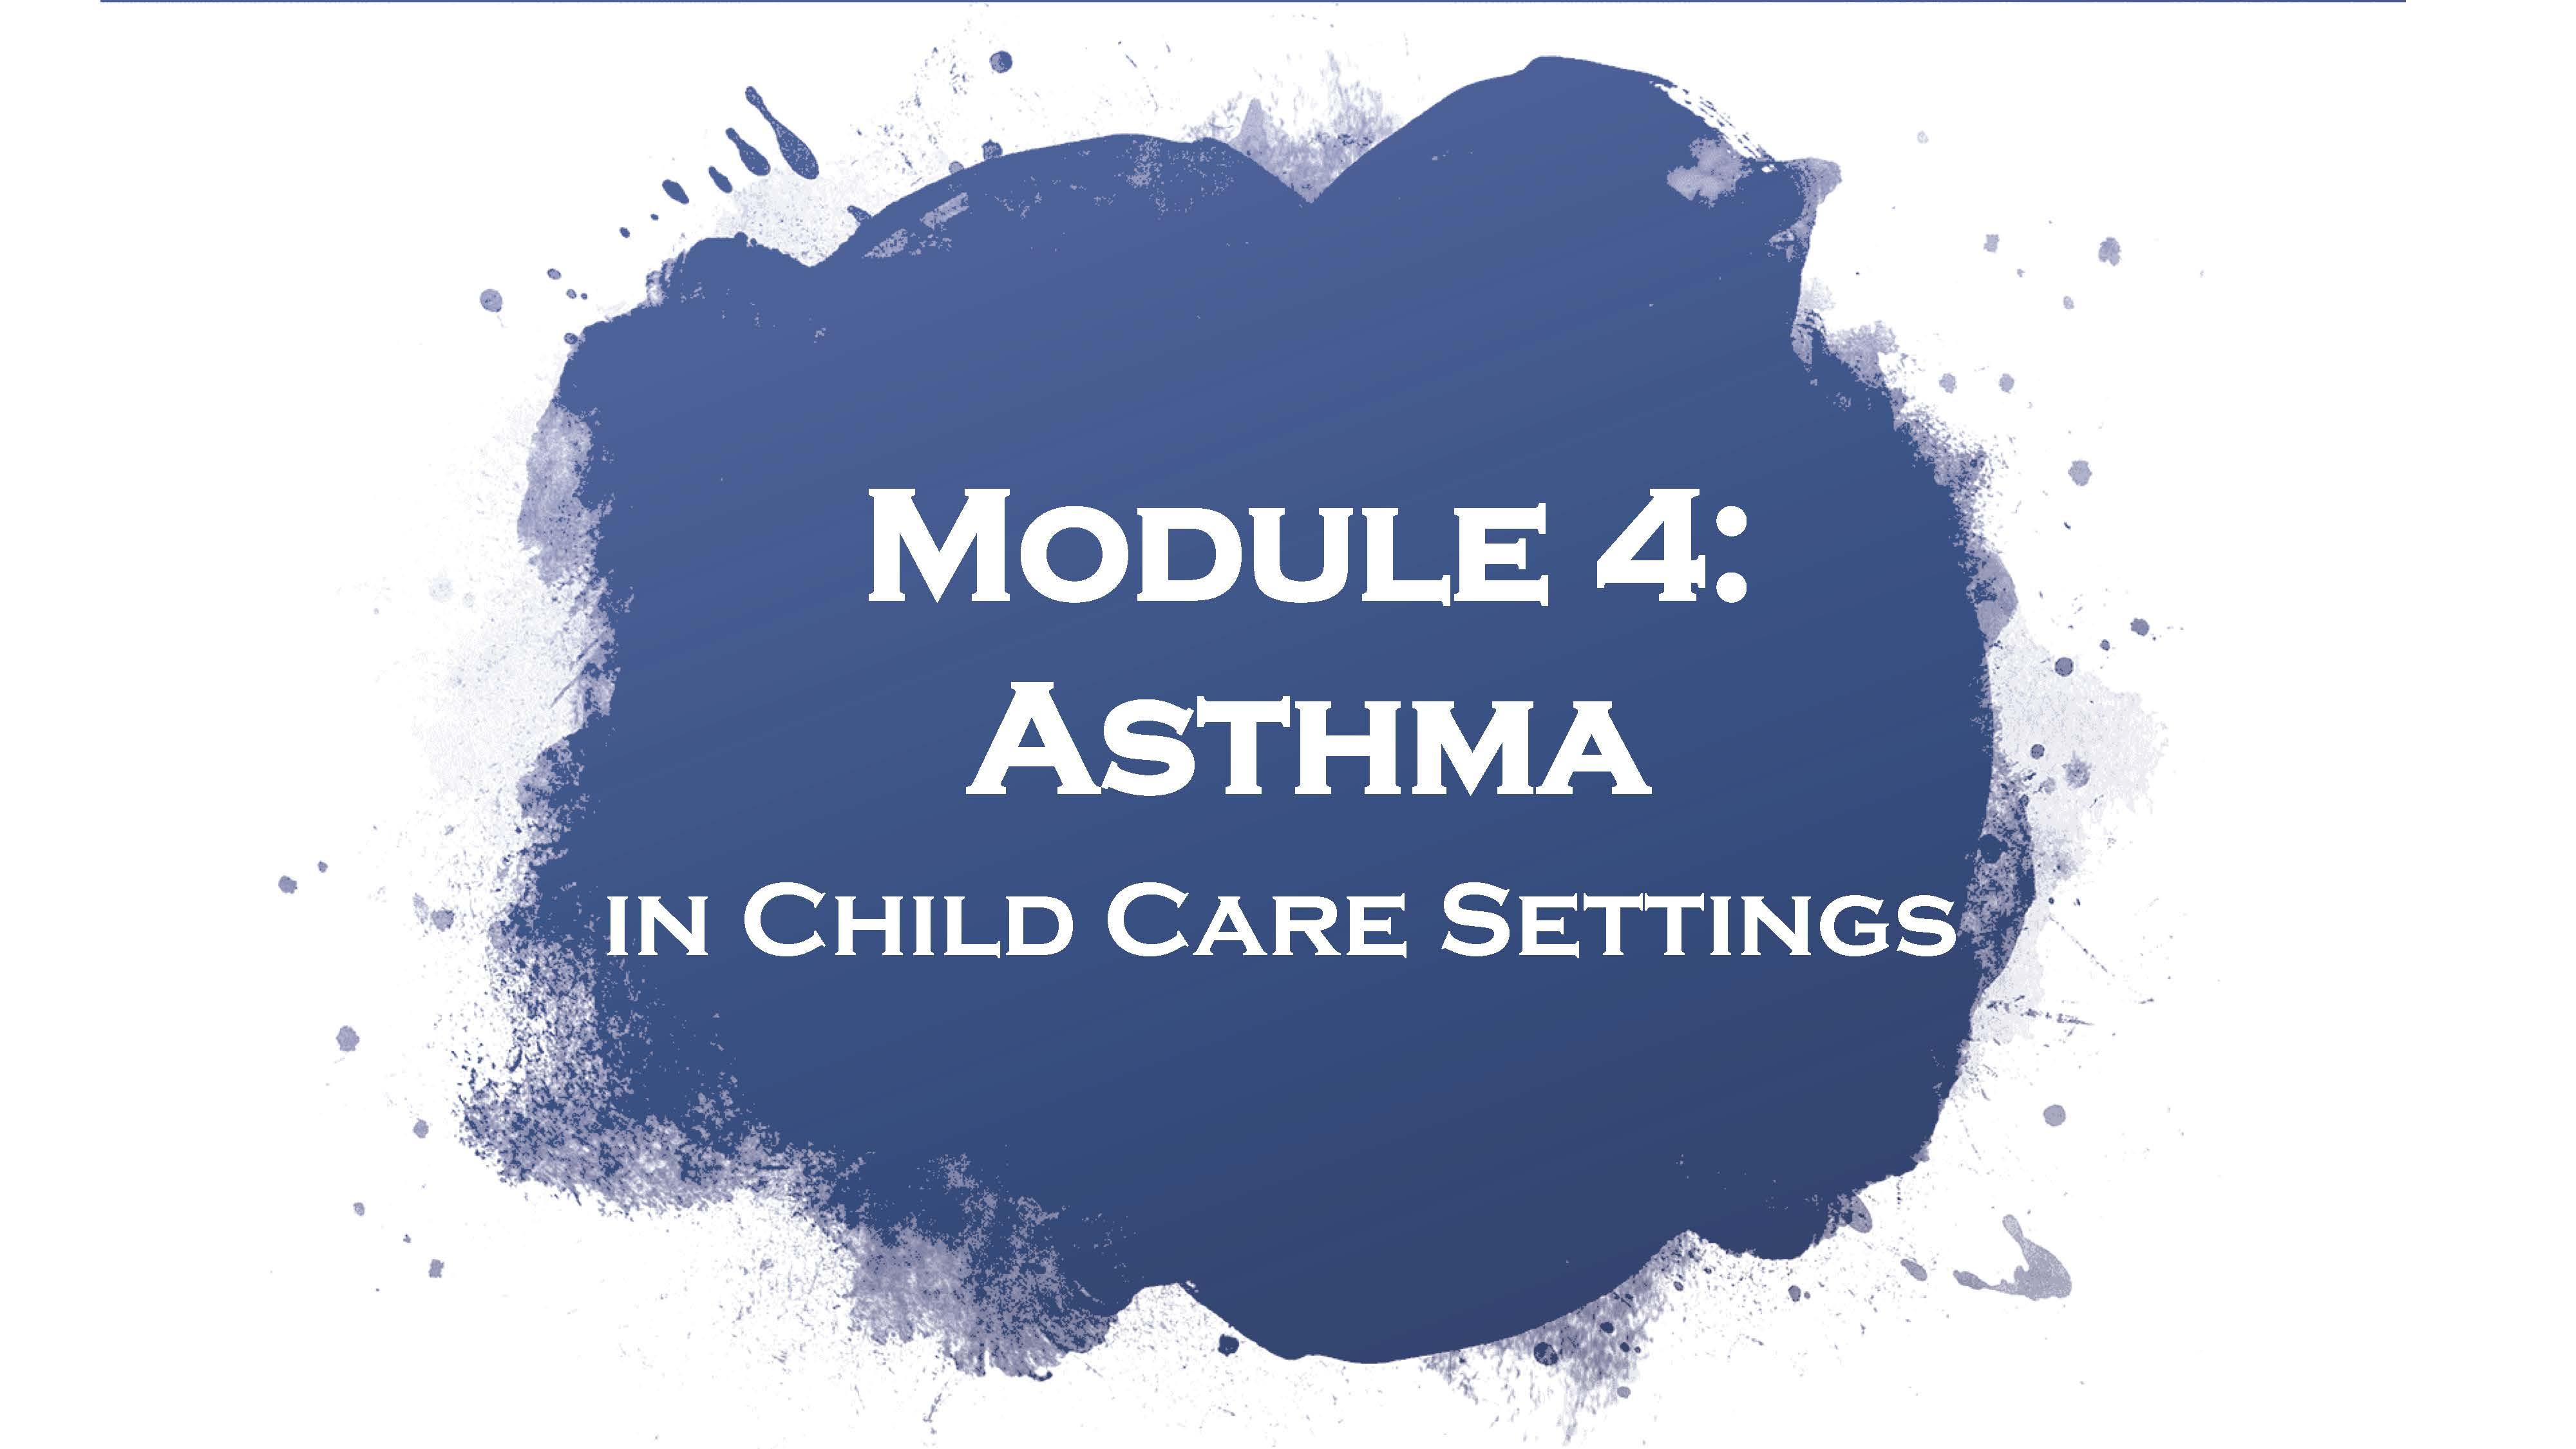 Module 4: Asthma